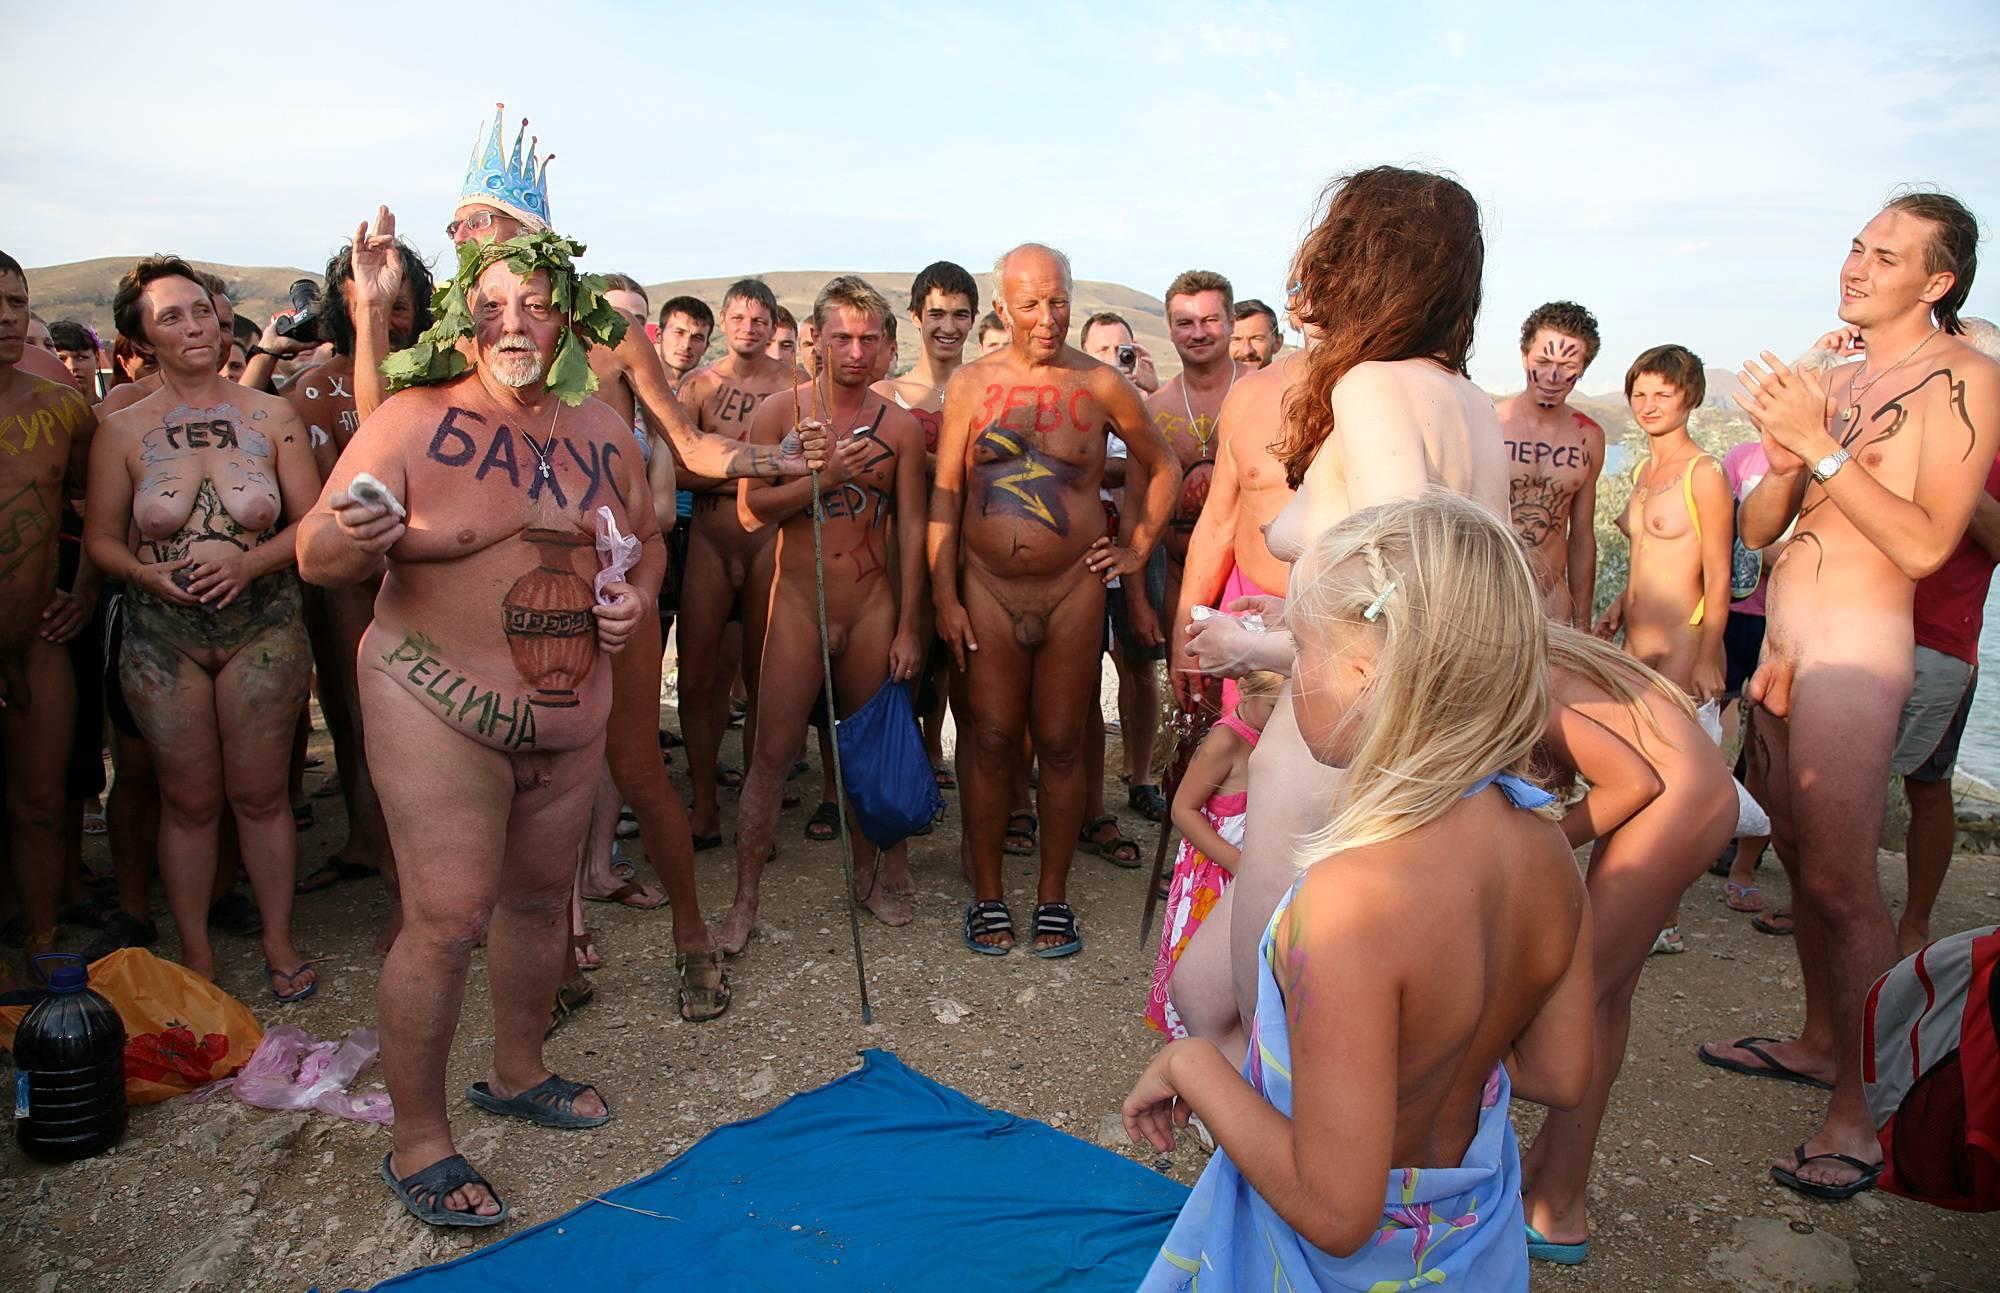 Pure Nudism Photos-Bright Beach Swordplay - 4